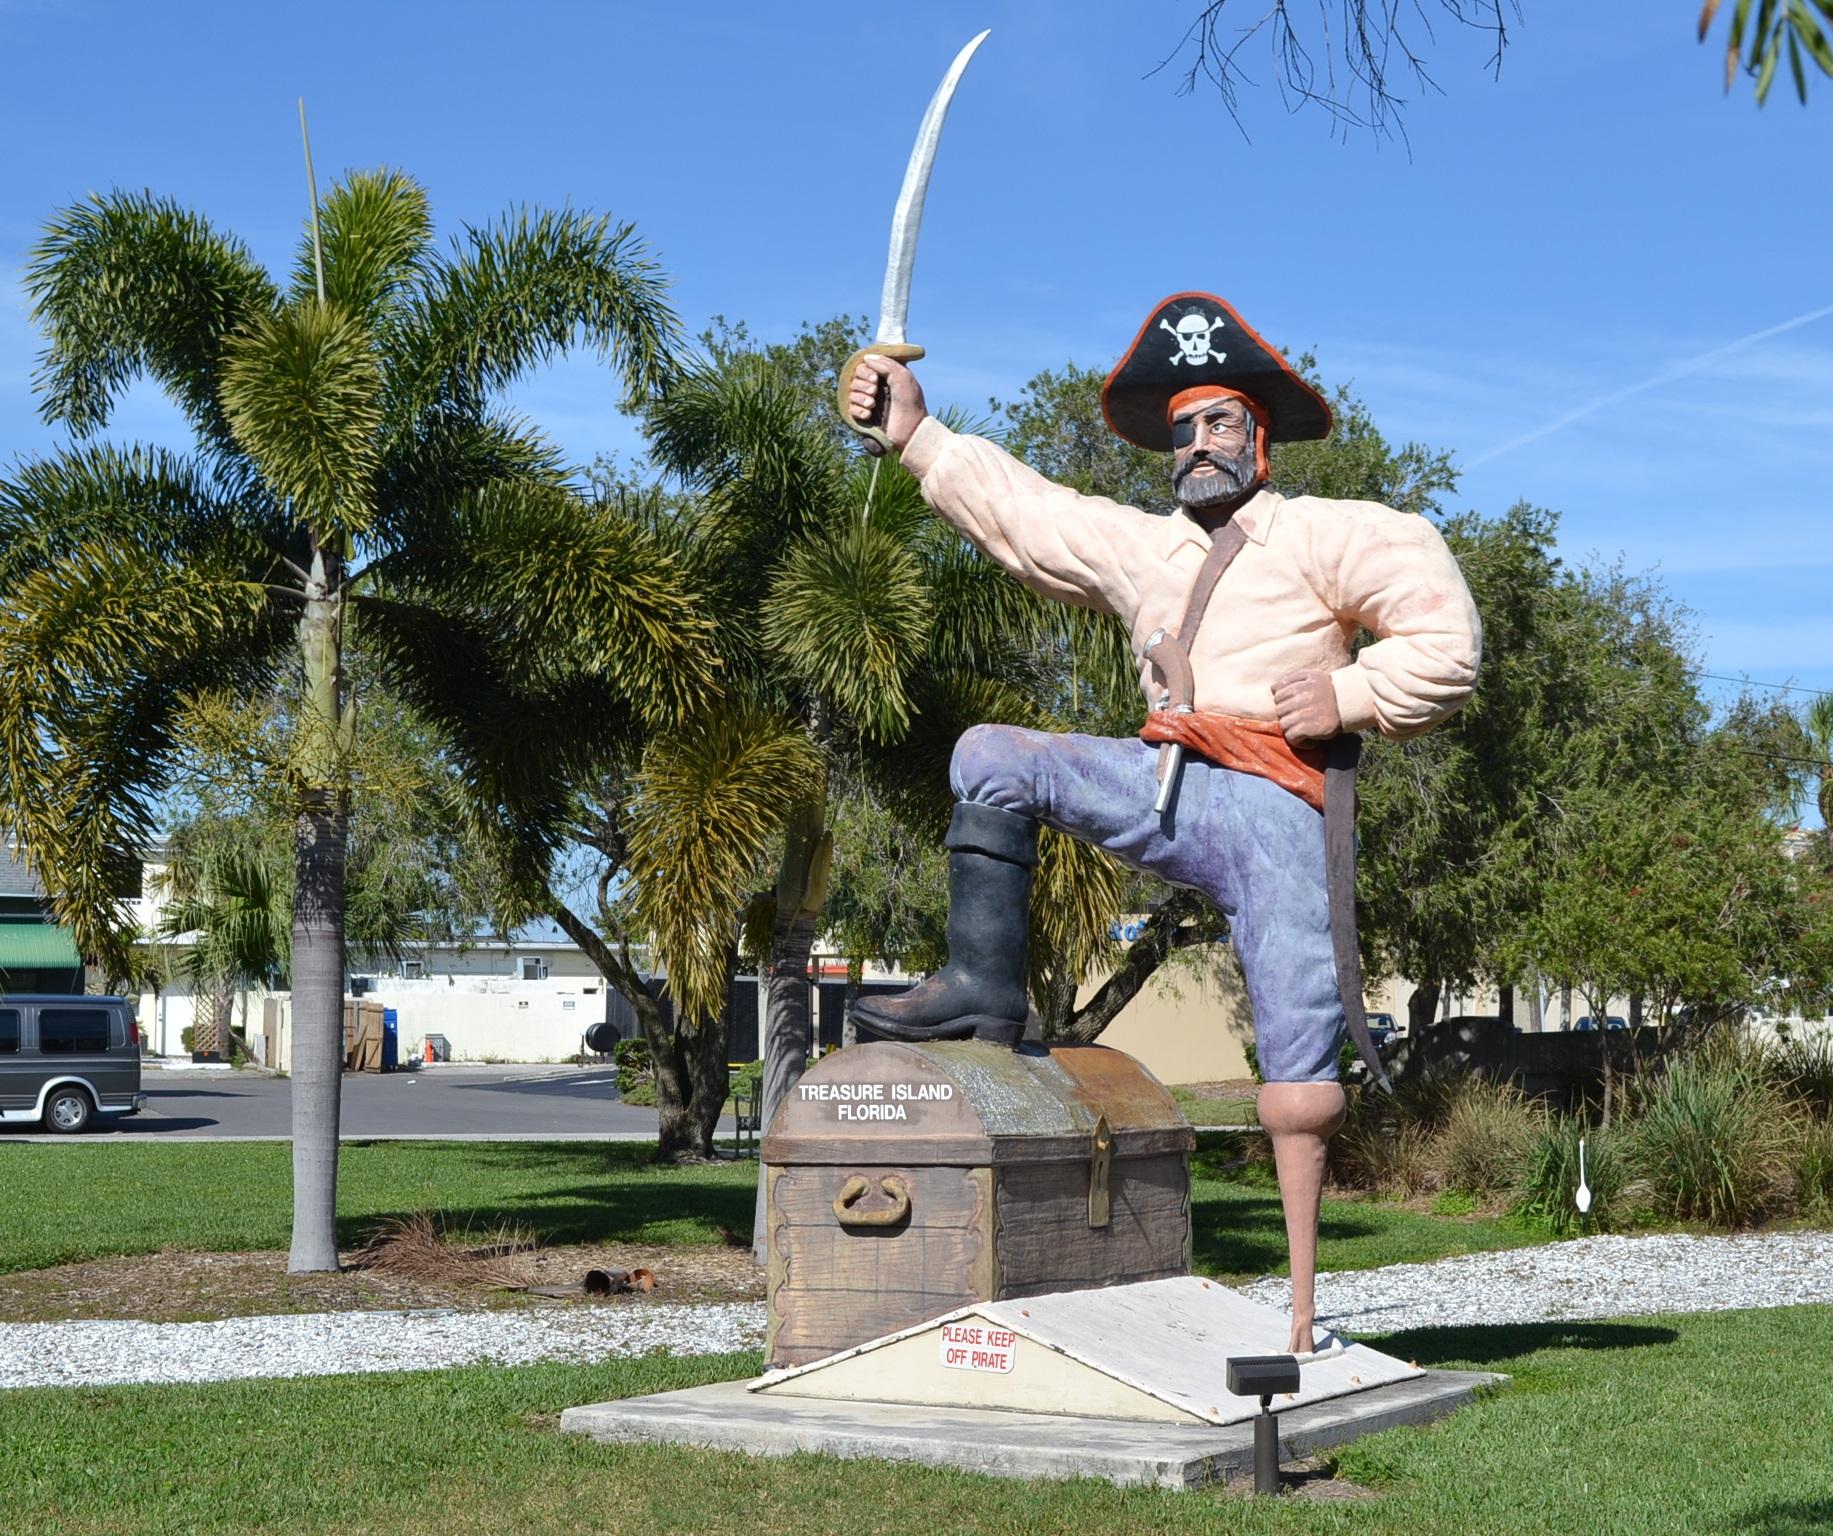 Treasure Island Beach: Shaking Hands With Pirates